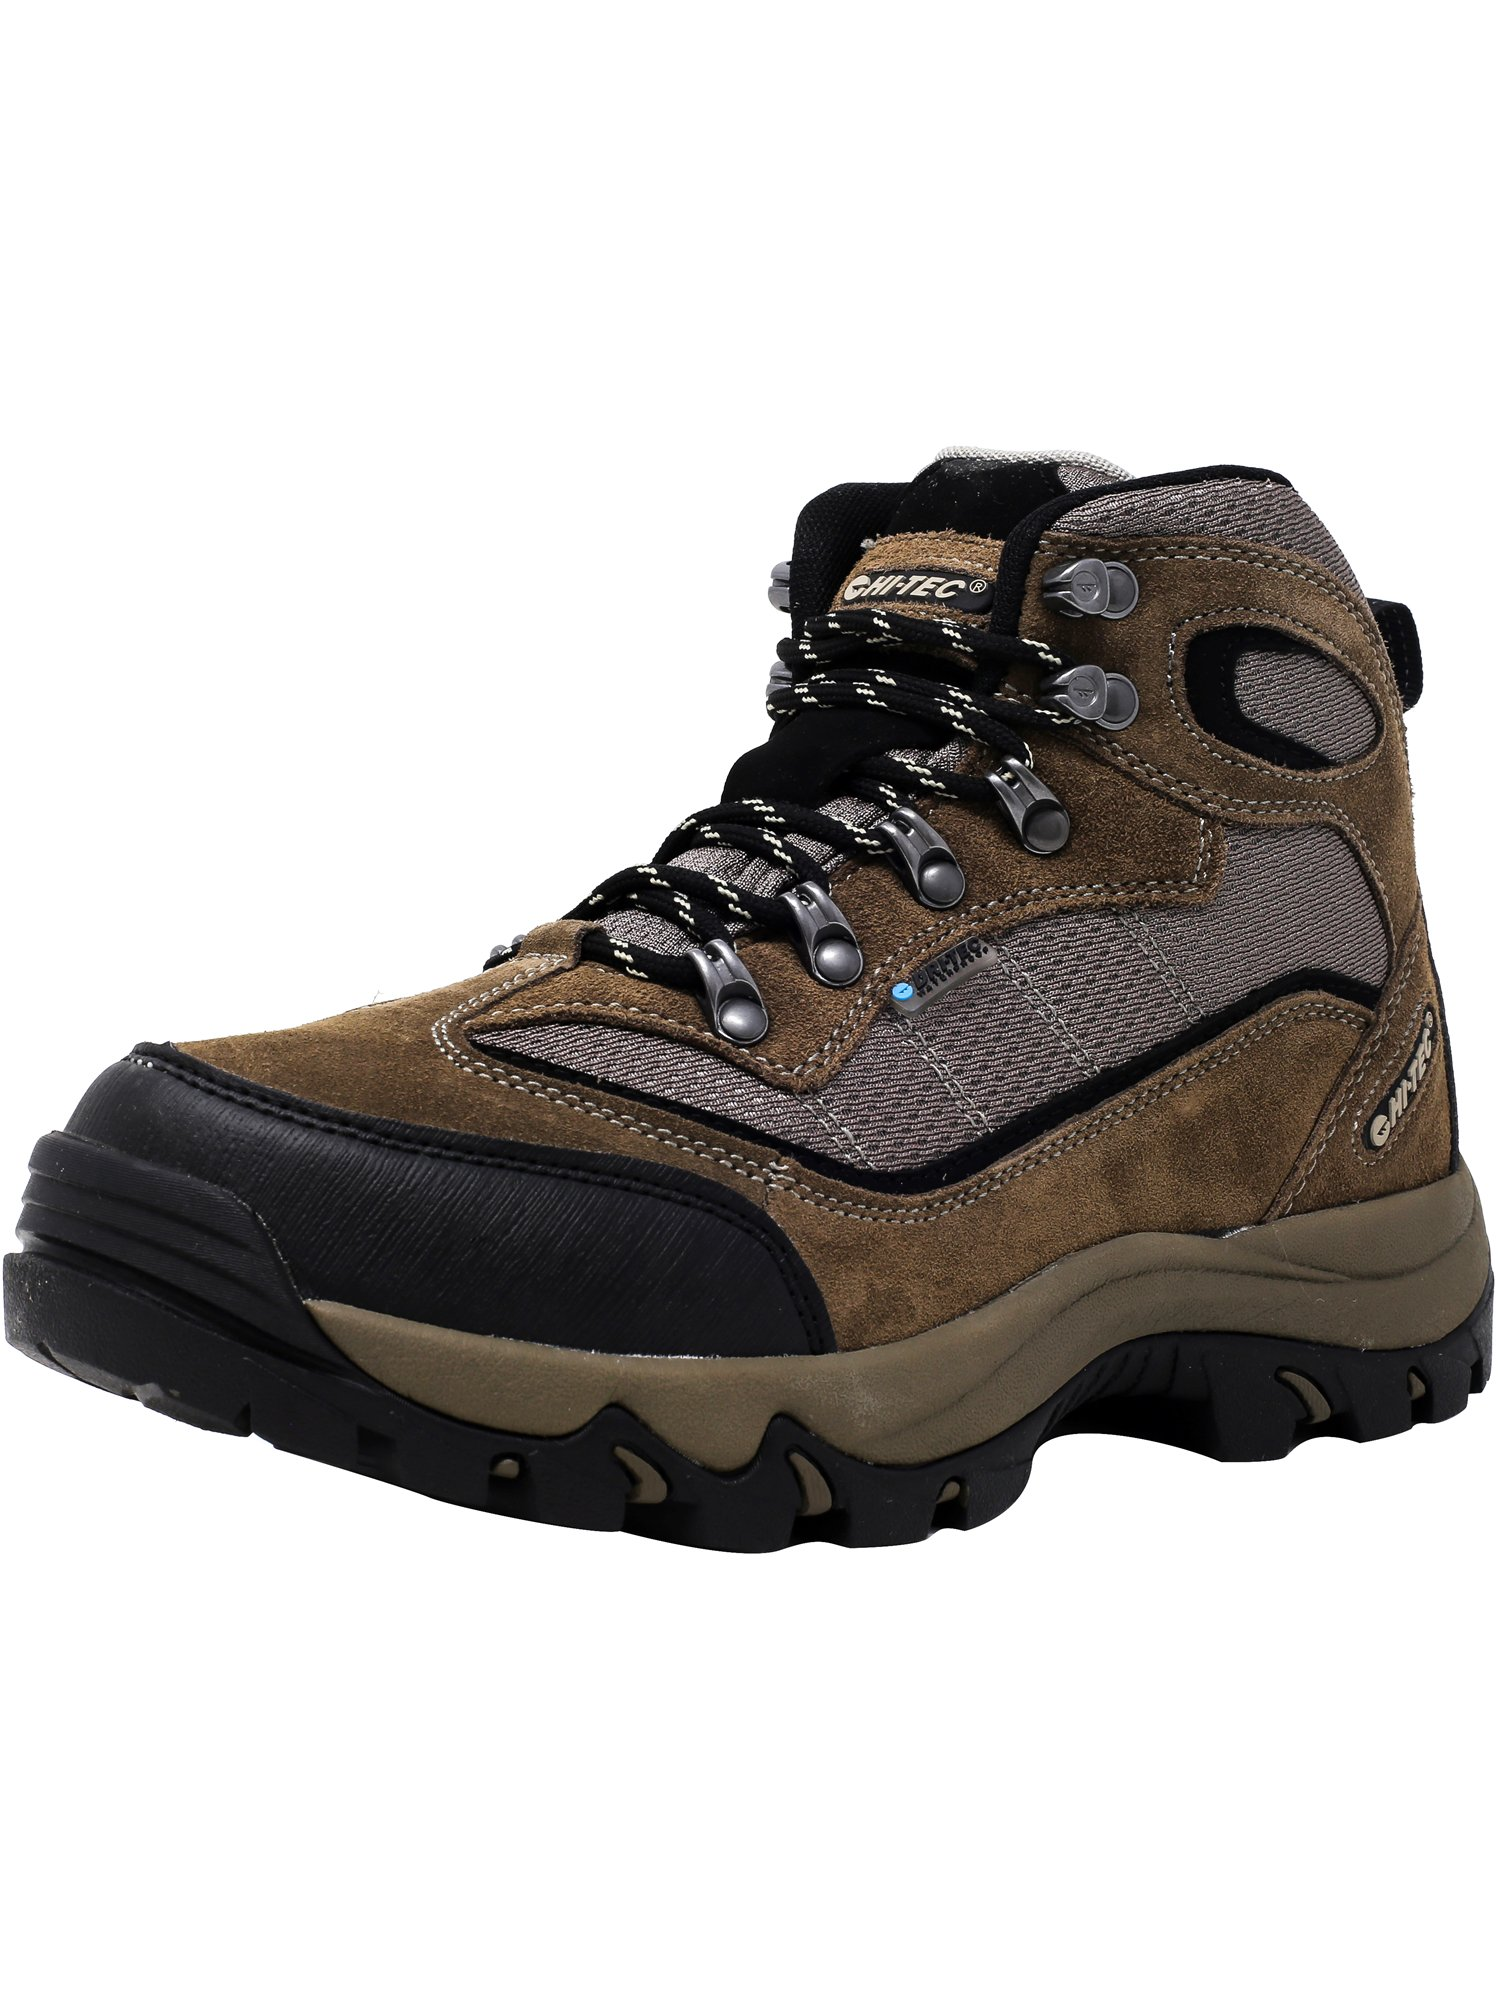 Hi-Tec Mens 52124 Skamania Waterproof Hiking Boots Smokey Brown Olive Snow by Hi-Tec